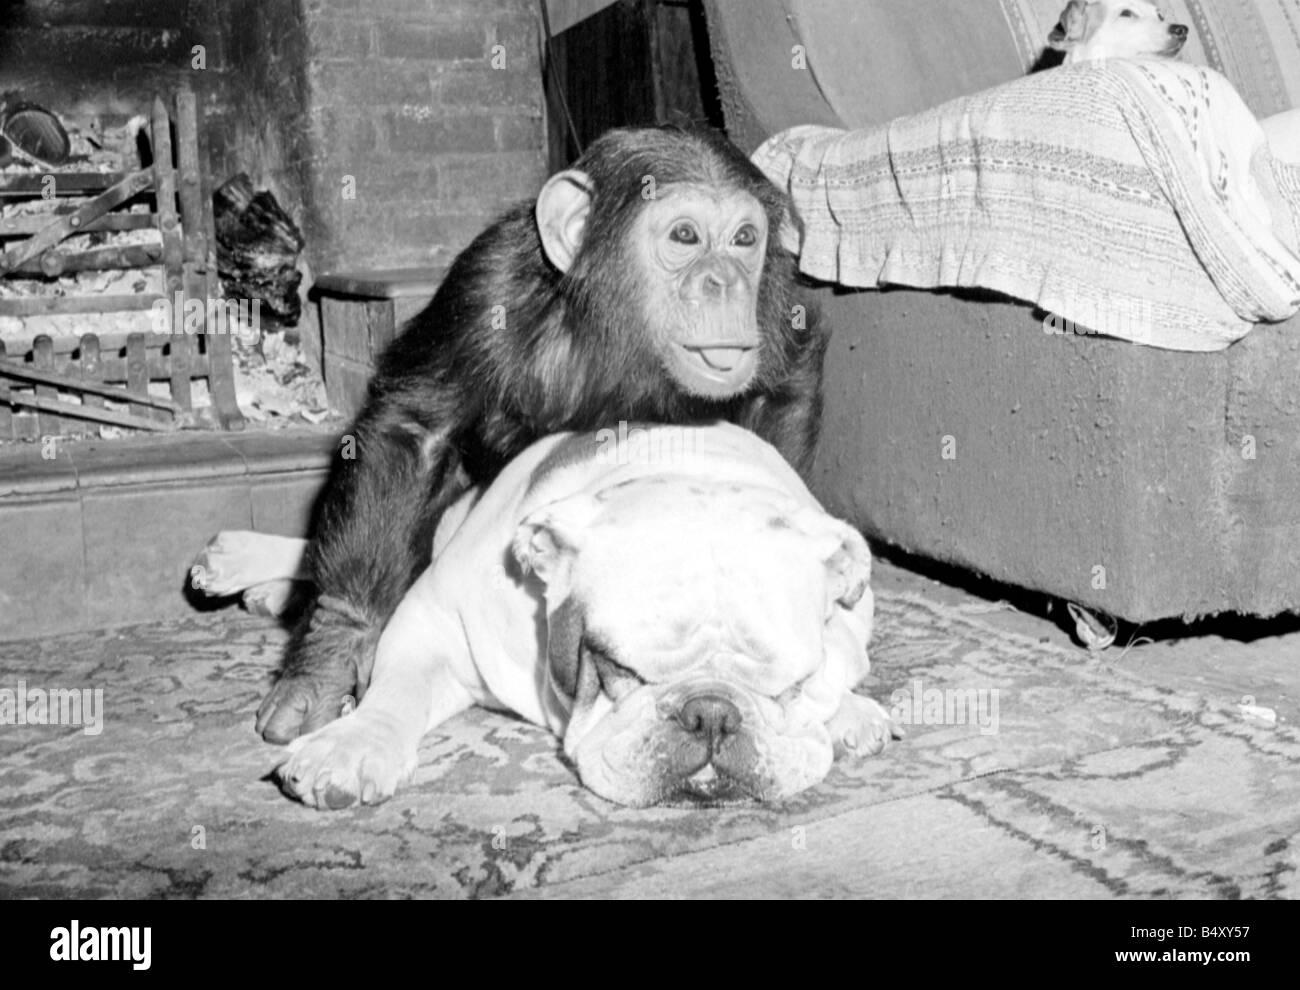 sparky the chimpanzee relaxes with a bulldog sleeping on a hearthrug april rev - Hearth Rug